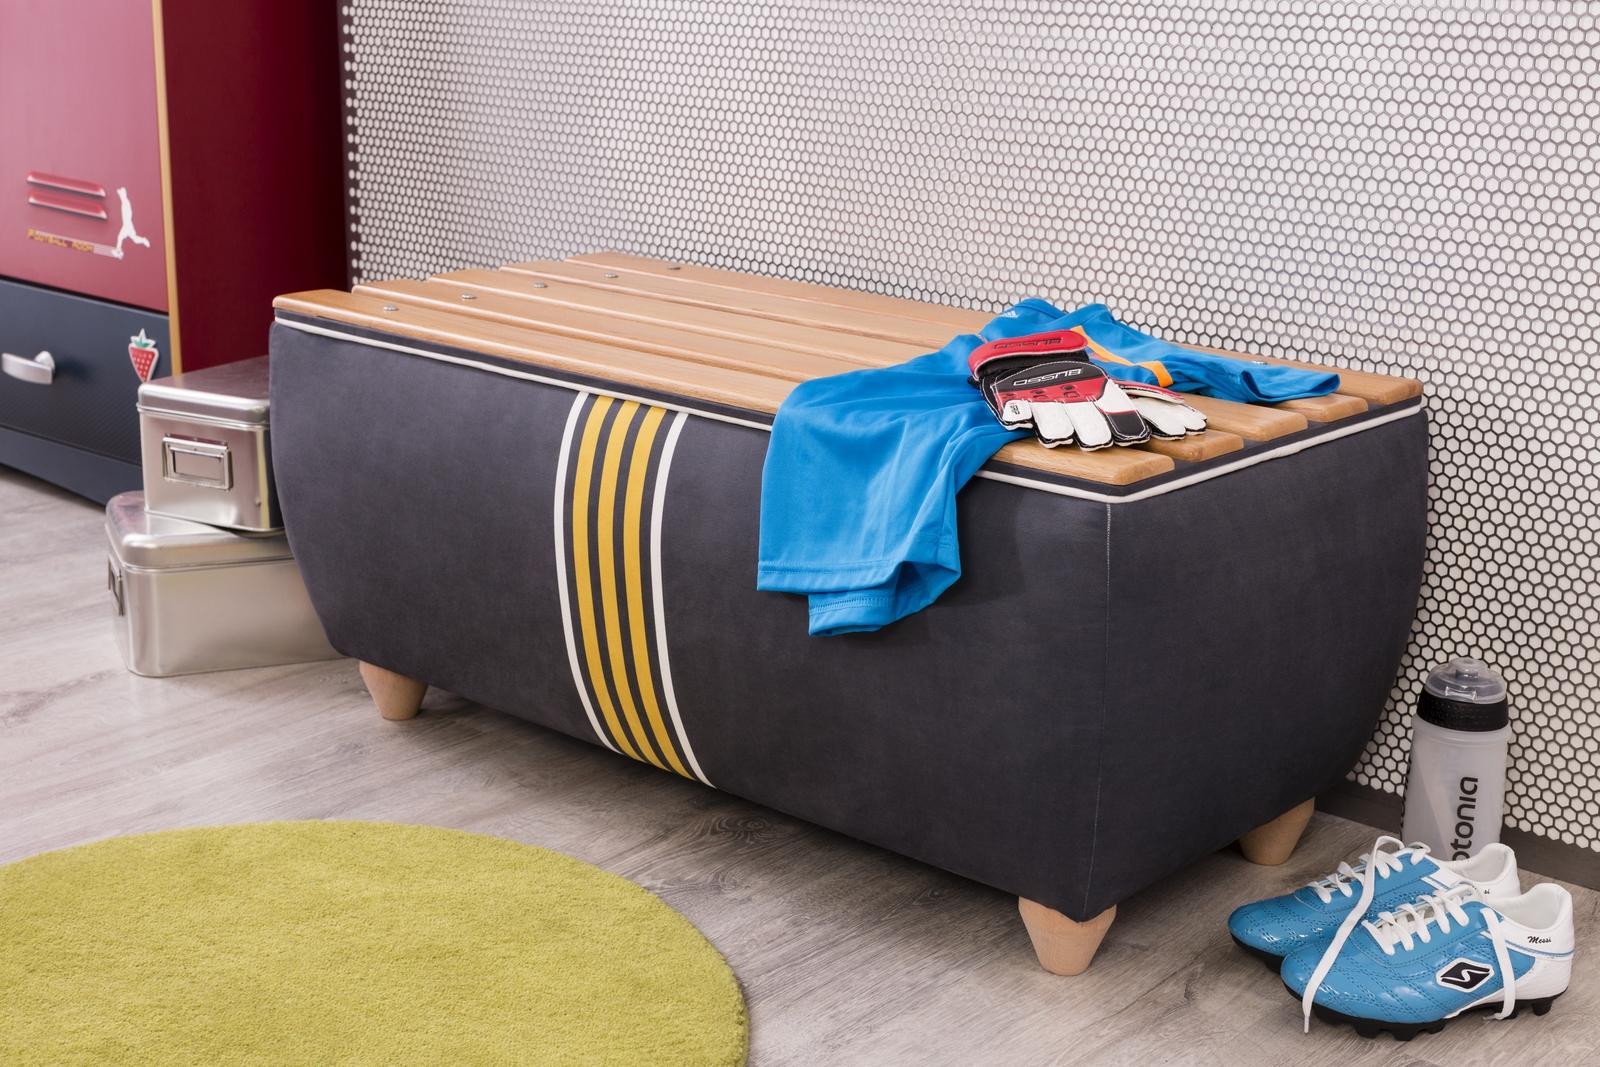 Voetbal Slaapkamer Accessoires : Badkamer slaapkamer accessoire leukste slaapkamer accessoires op